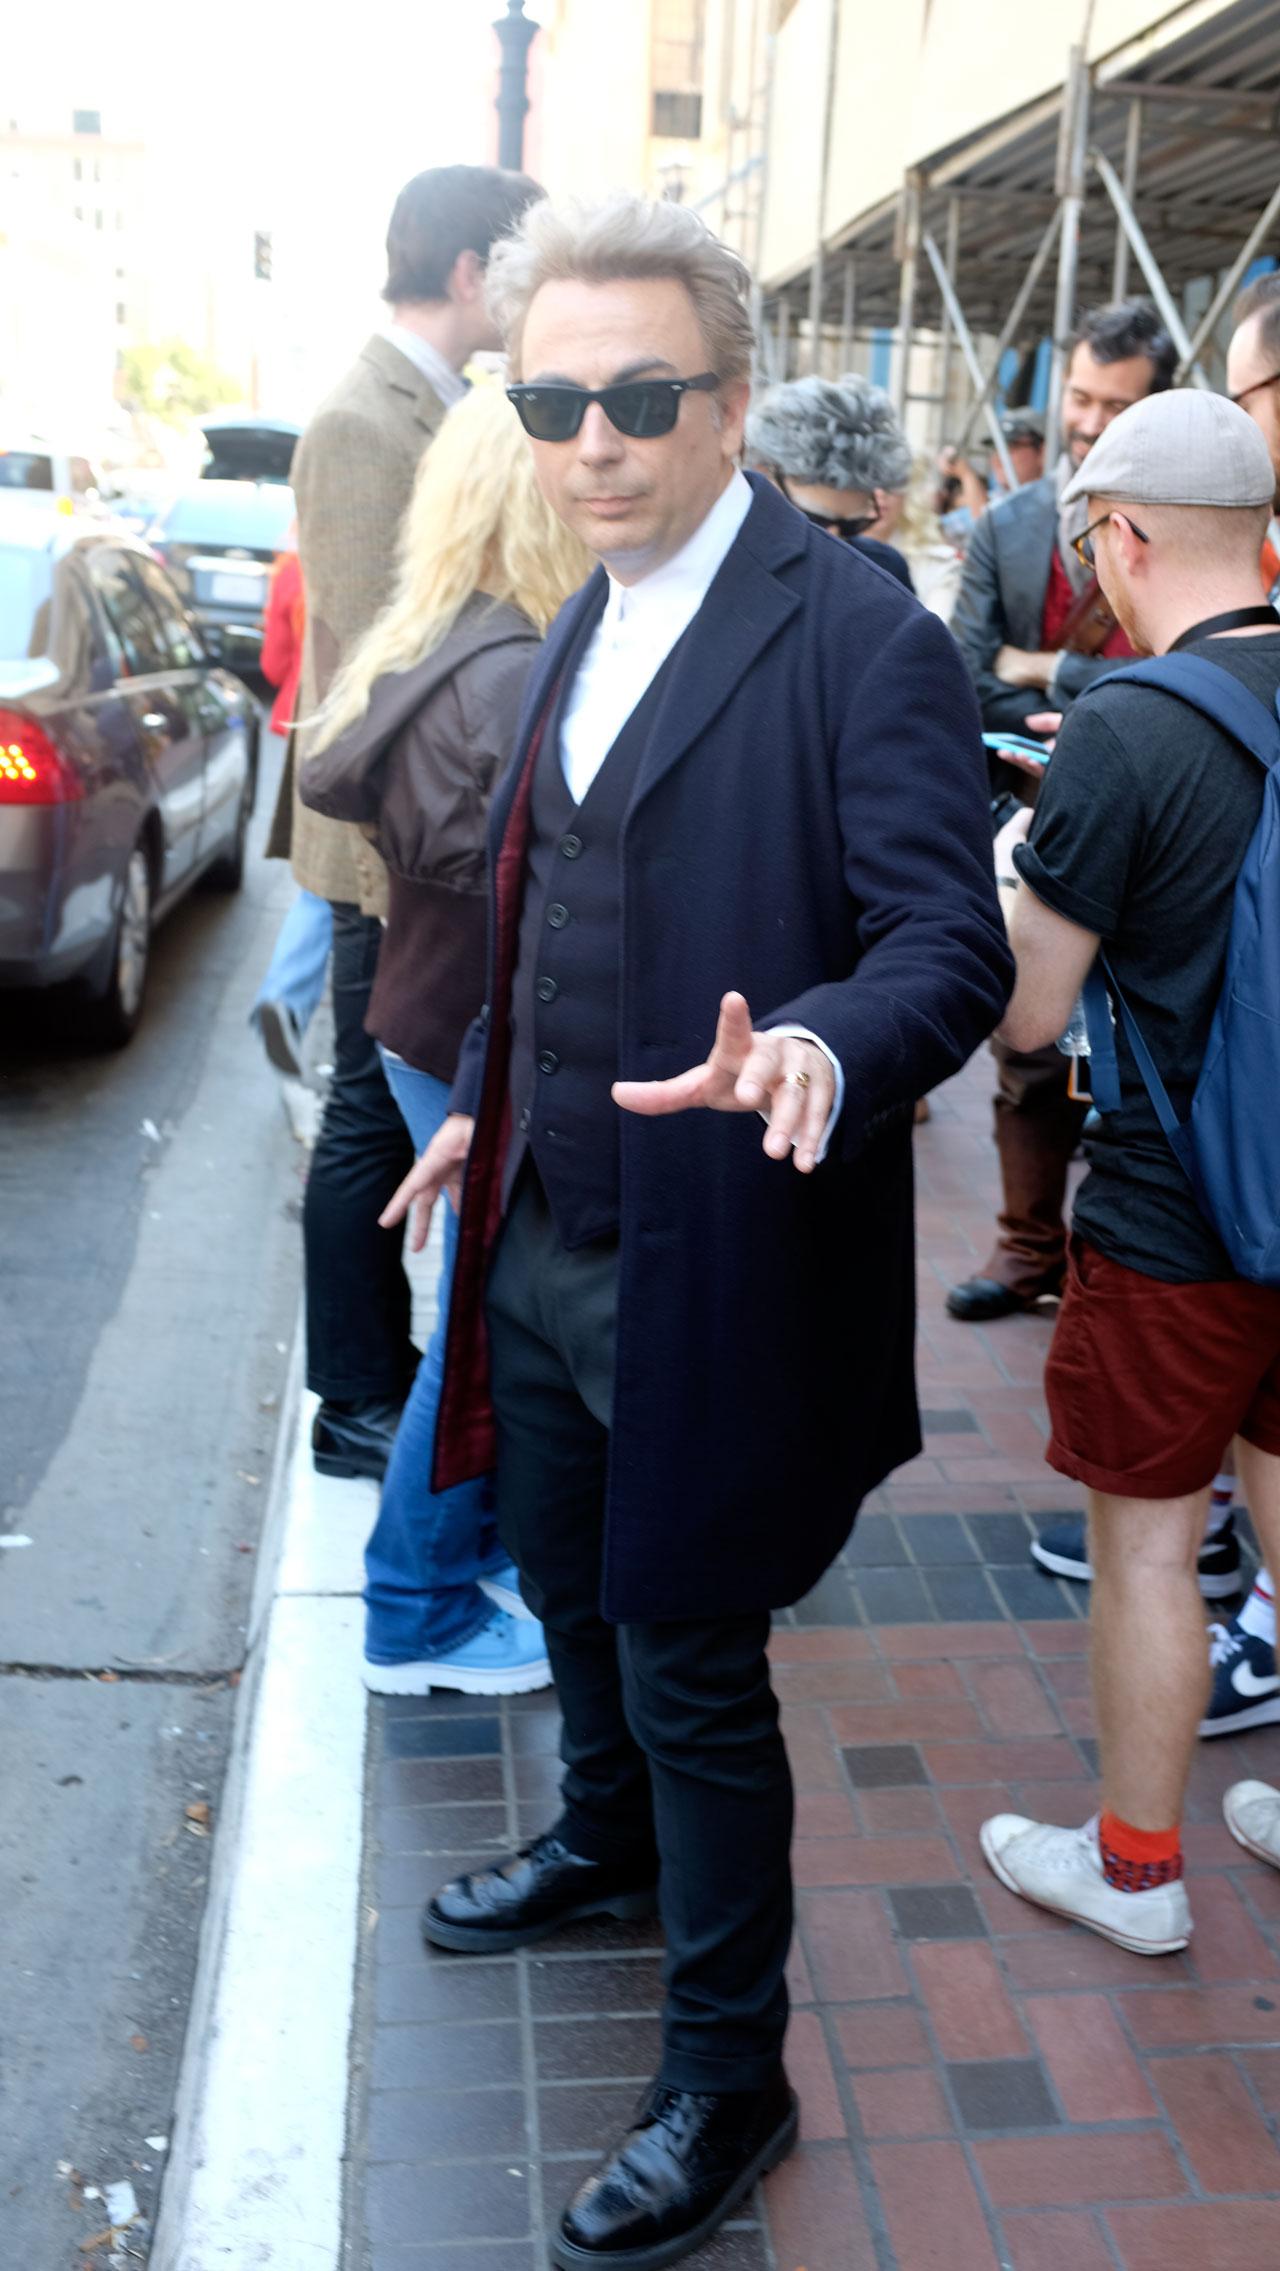 Uncanny Twelfth Doctor cosplay from Stephen Prescott. (Photo: Kevin Wicks/BBC AMERICA)